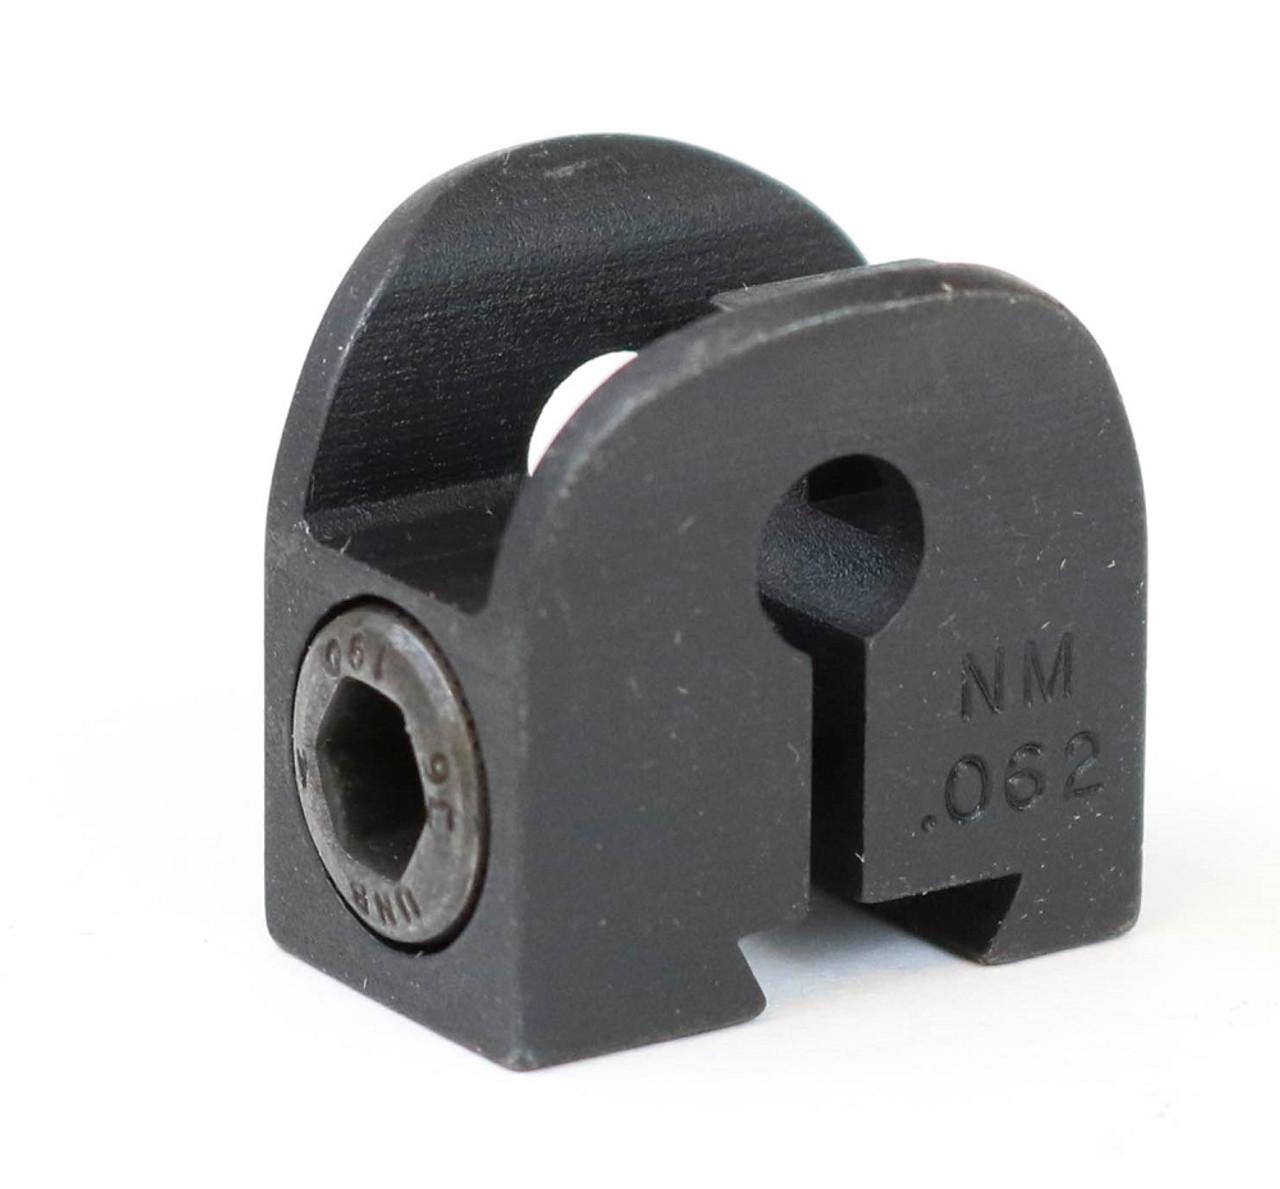 M1 Garand National Match Front Sight NM .062 Blade w/ Screw